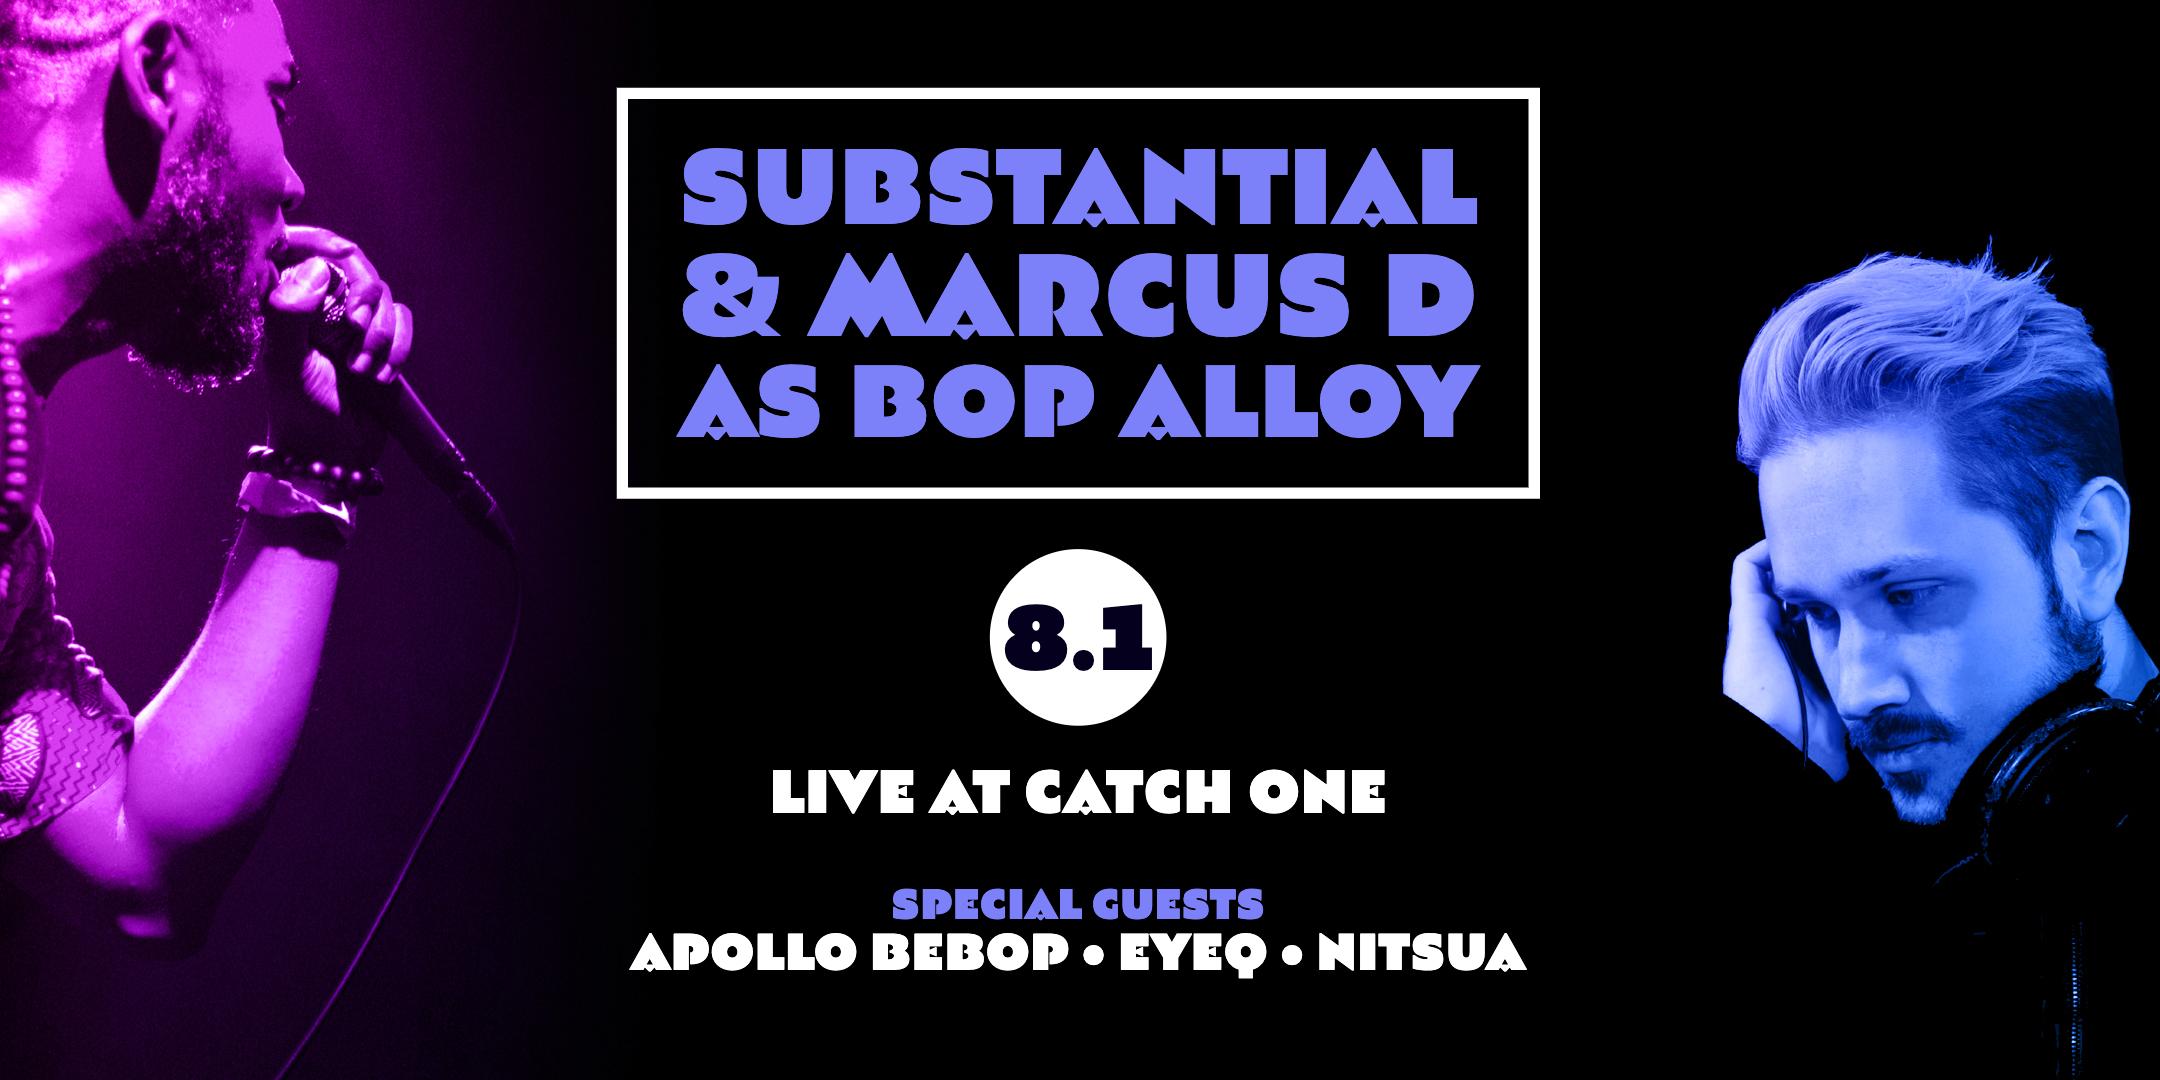 Bop Alloy LA banner.jpg